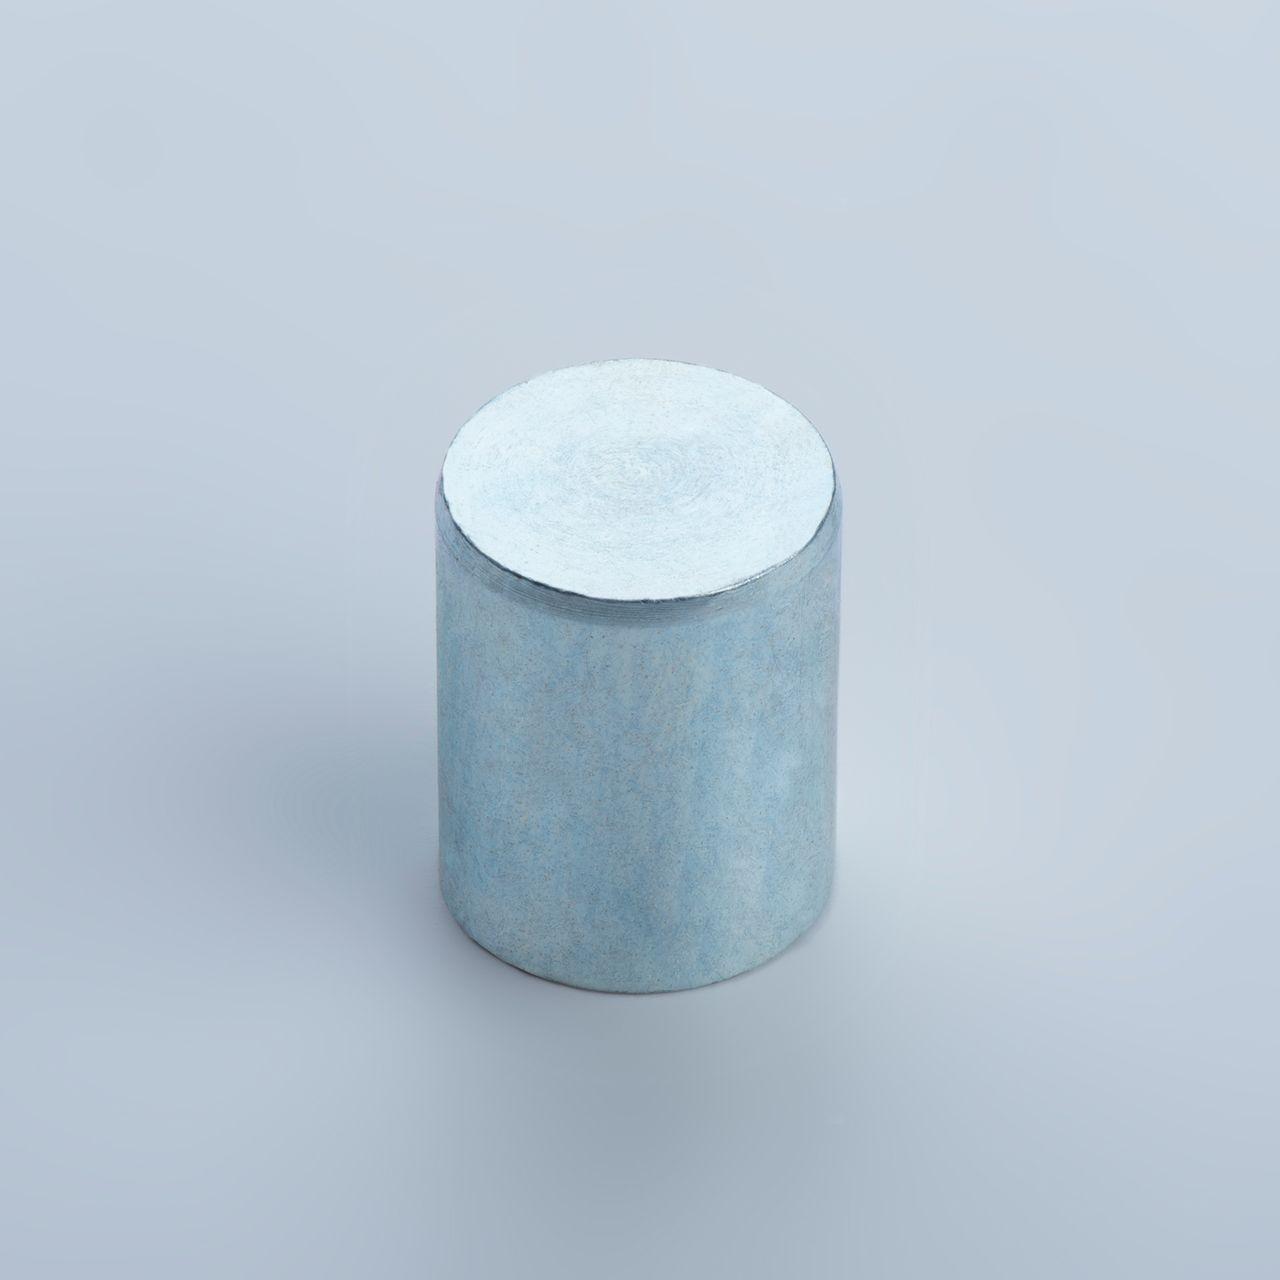 Stabgreifer aus AlNiCo, Stahlgehäuse, verzinkt,  thyssenkrupp Magnettechnik